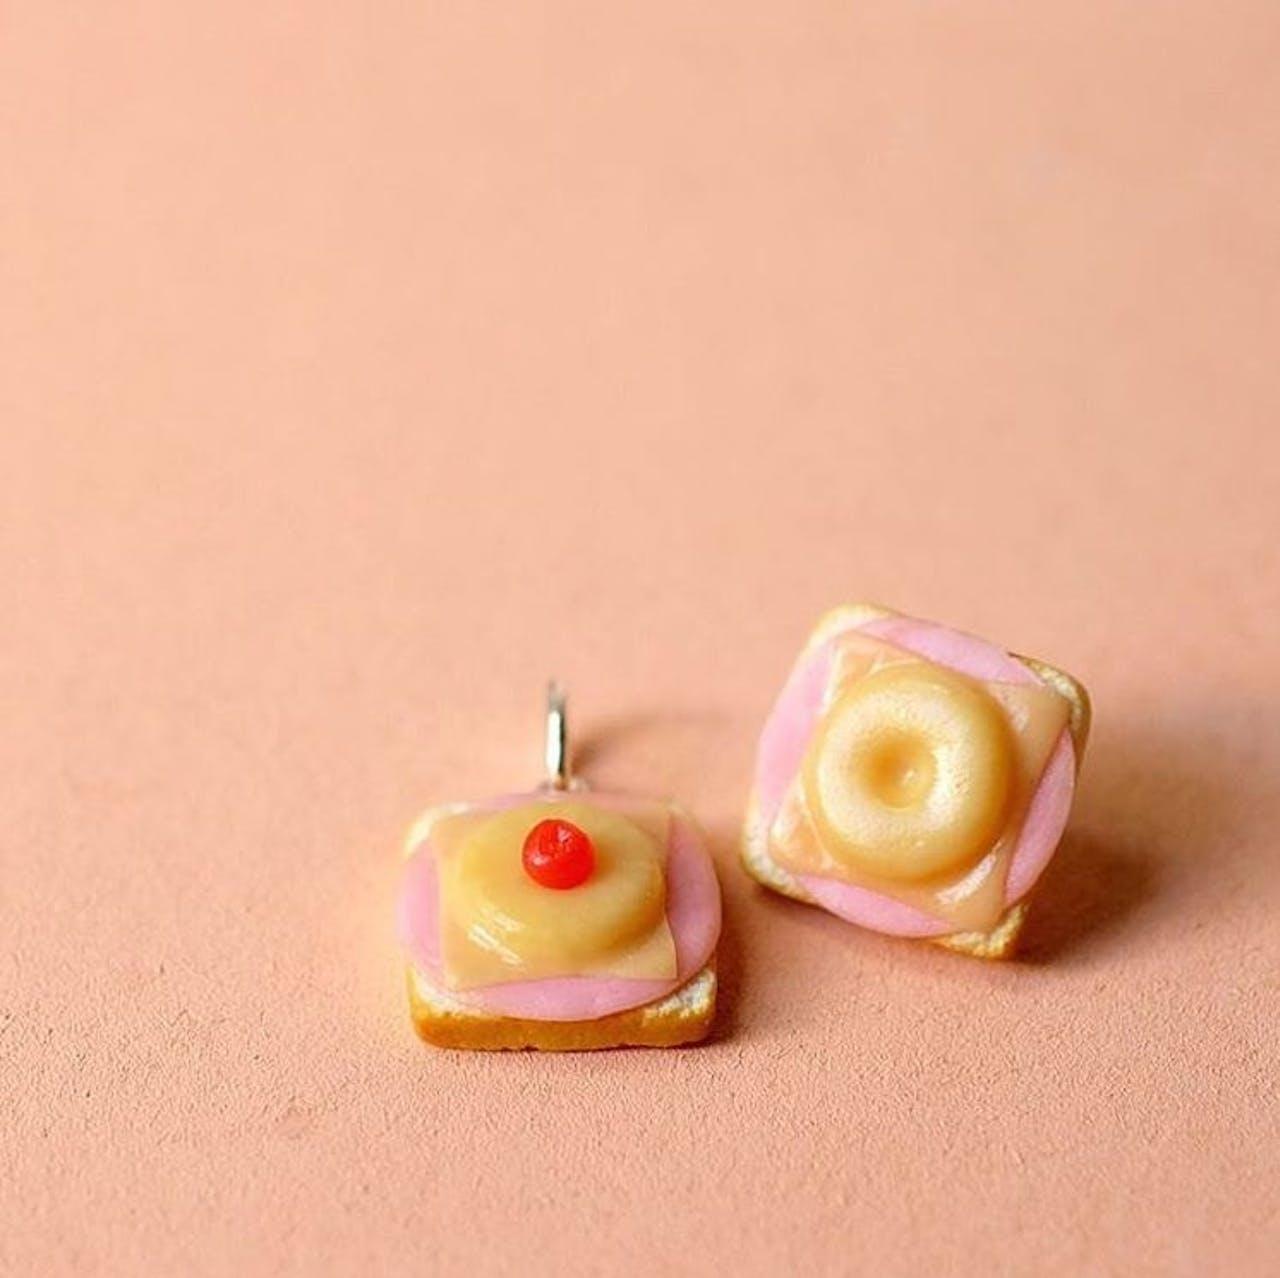 Miniaturen von Kamilla Kleinschmidt (Minischmidtblog) - Toast Hawaii